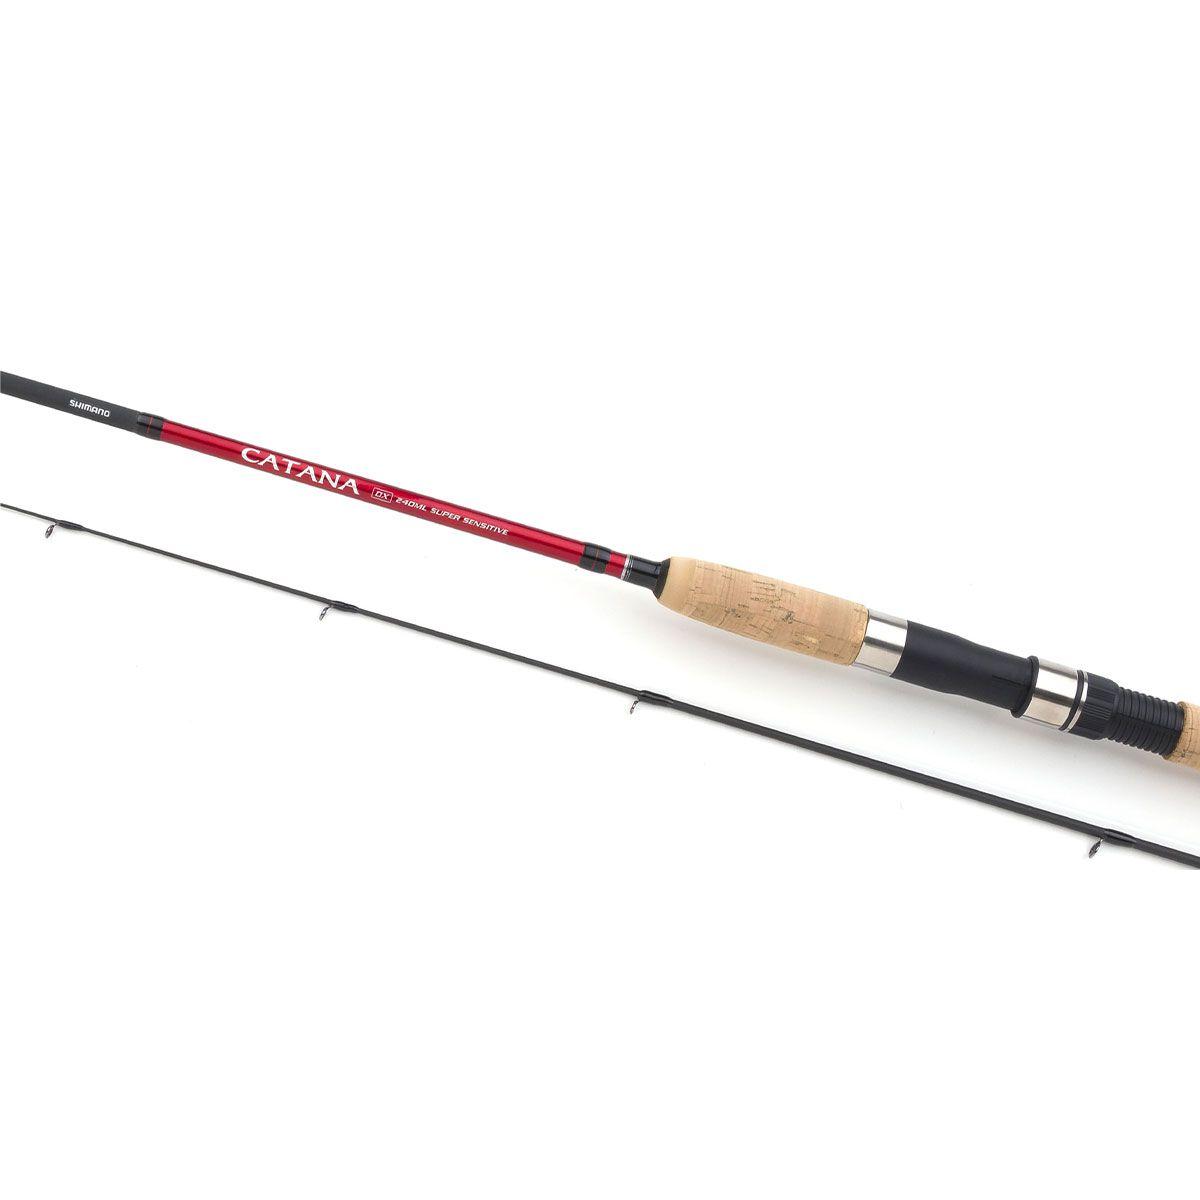 Vara Molinete Shimano Catana 2.10m 20-50G 2P